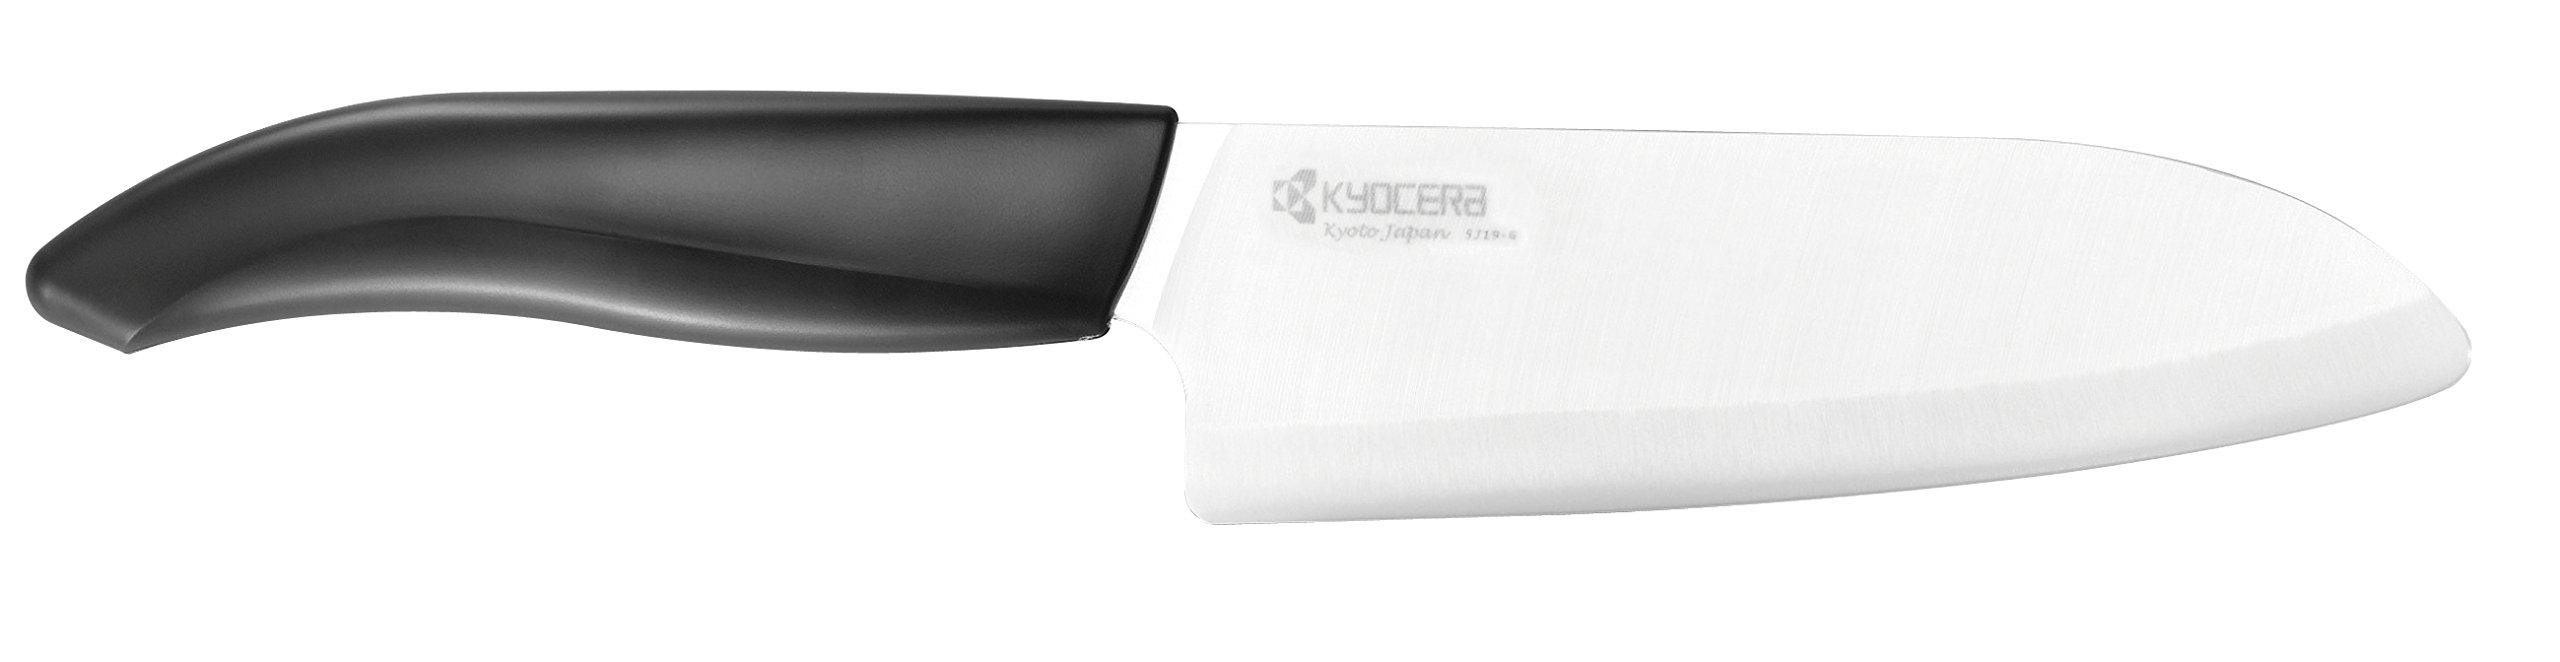 Kyocera Advanced Ceramic Revolution Series 5-1/2-inch Santoku Knife, Black Handle, White Blade